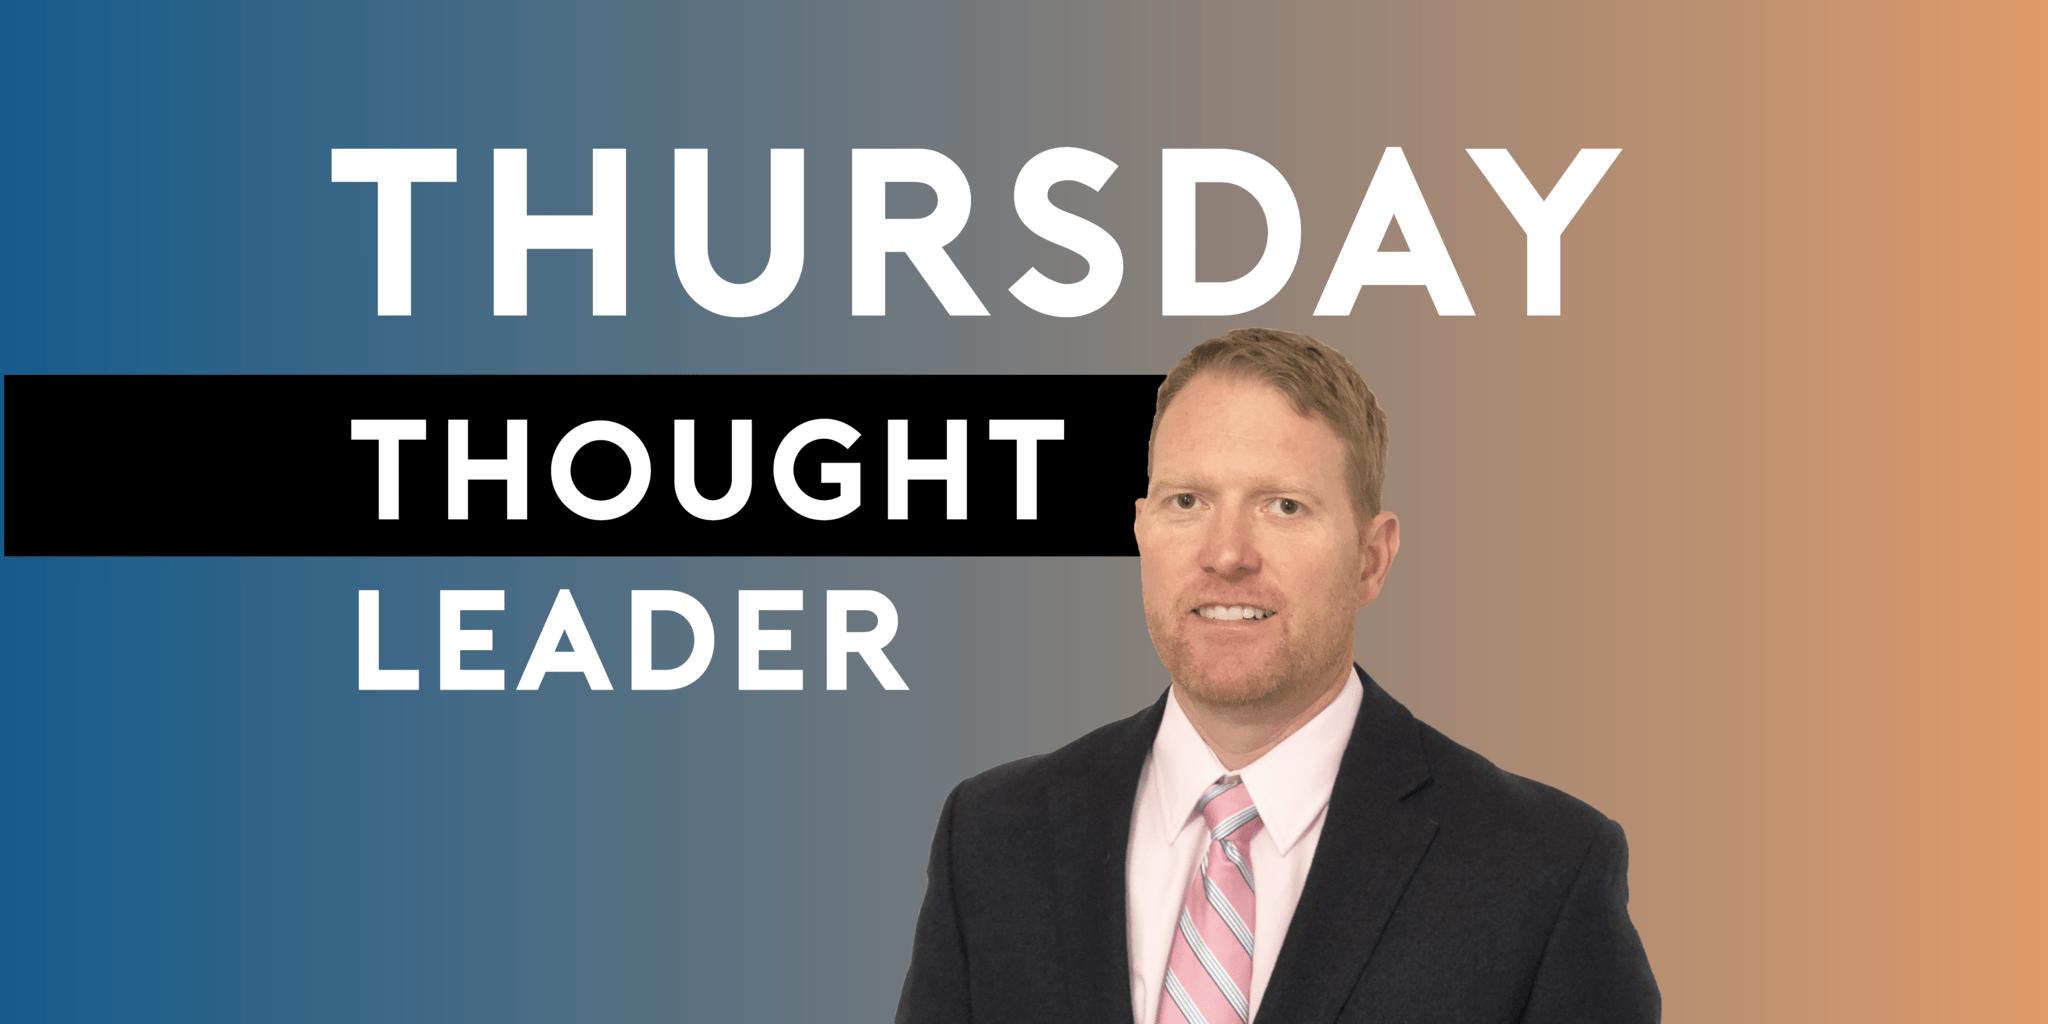 Jason Kolb of Smart Data Solutions is LegalNet Inc's Thursday Thought Leader